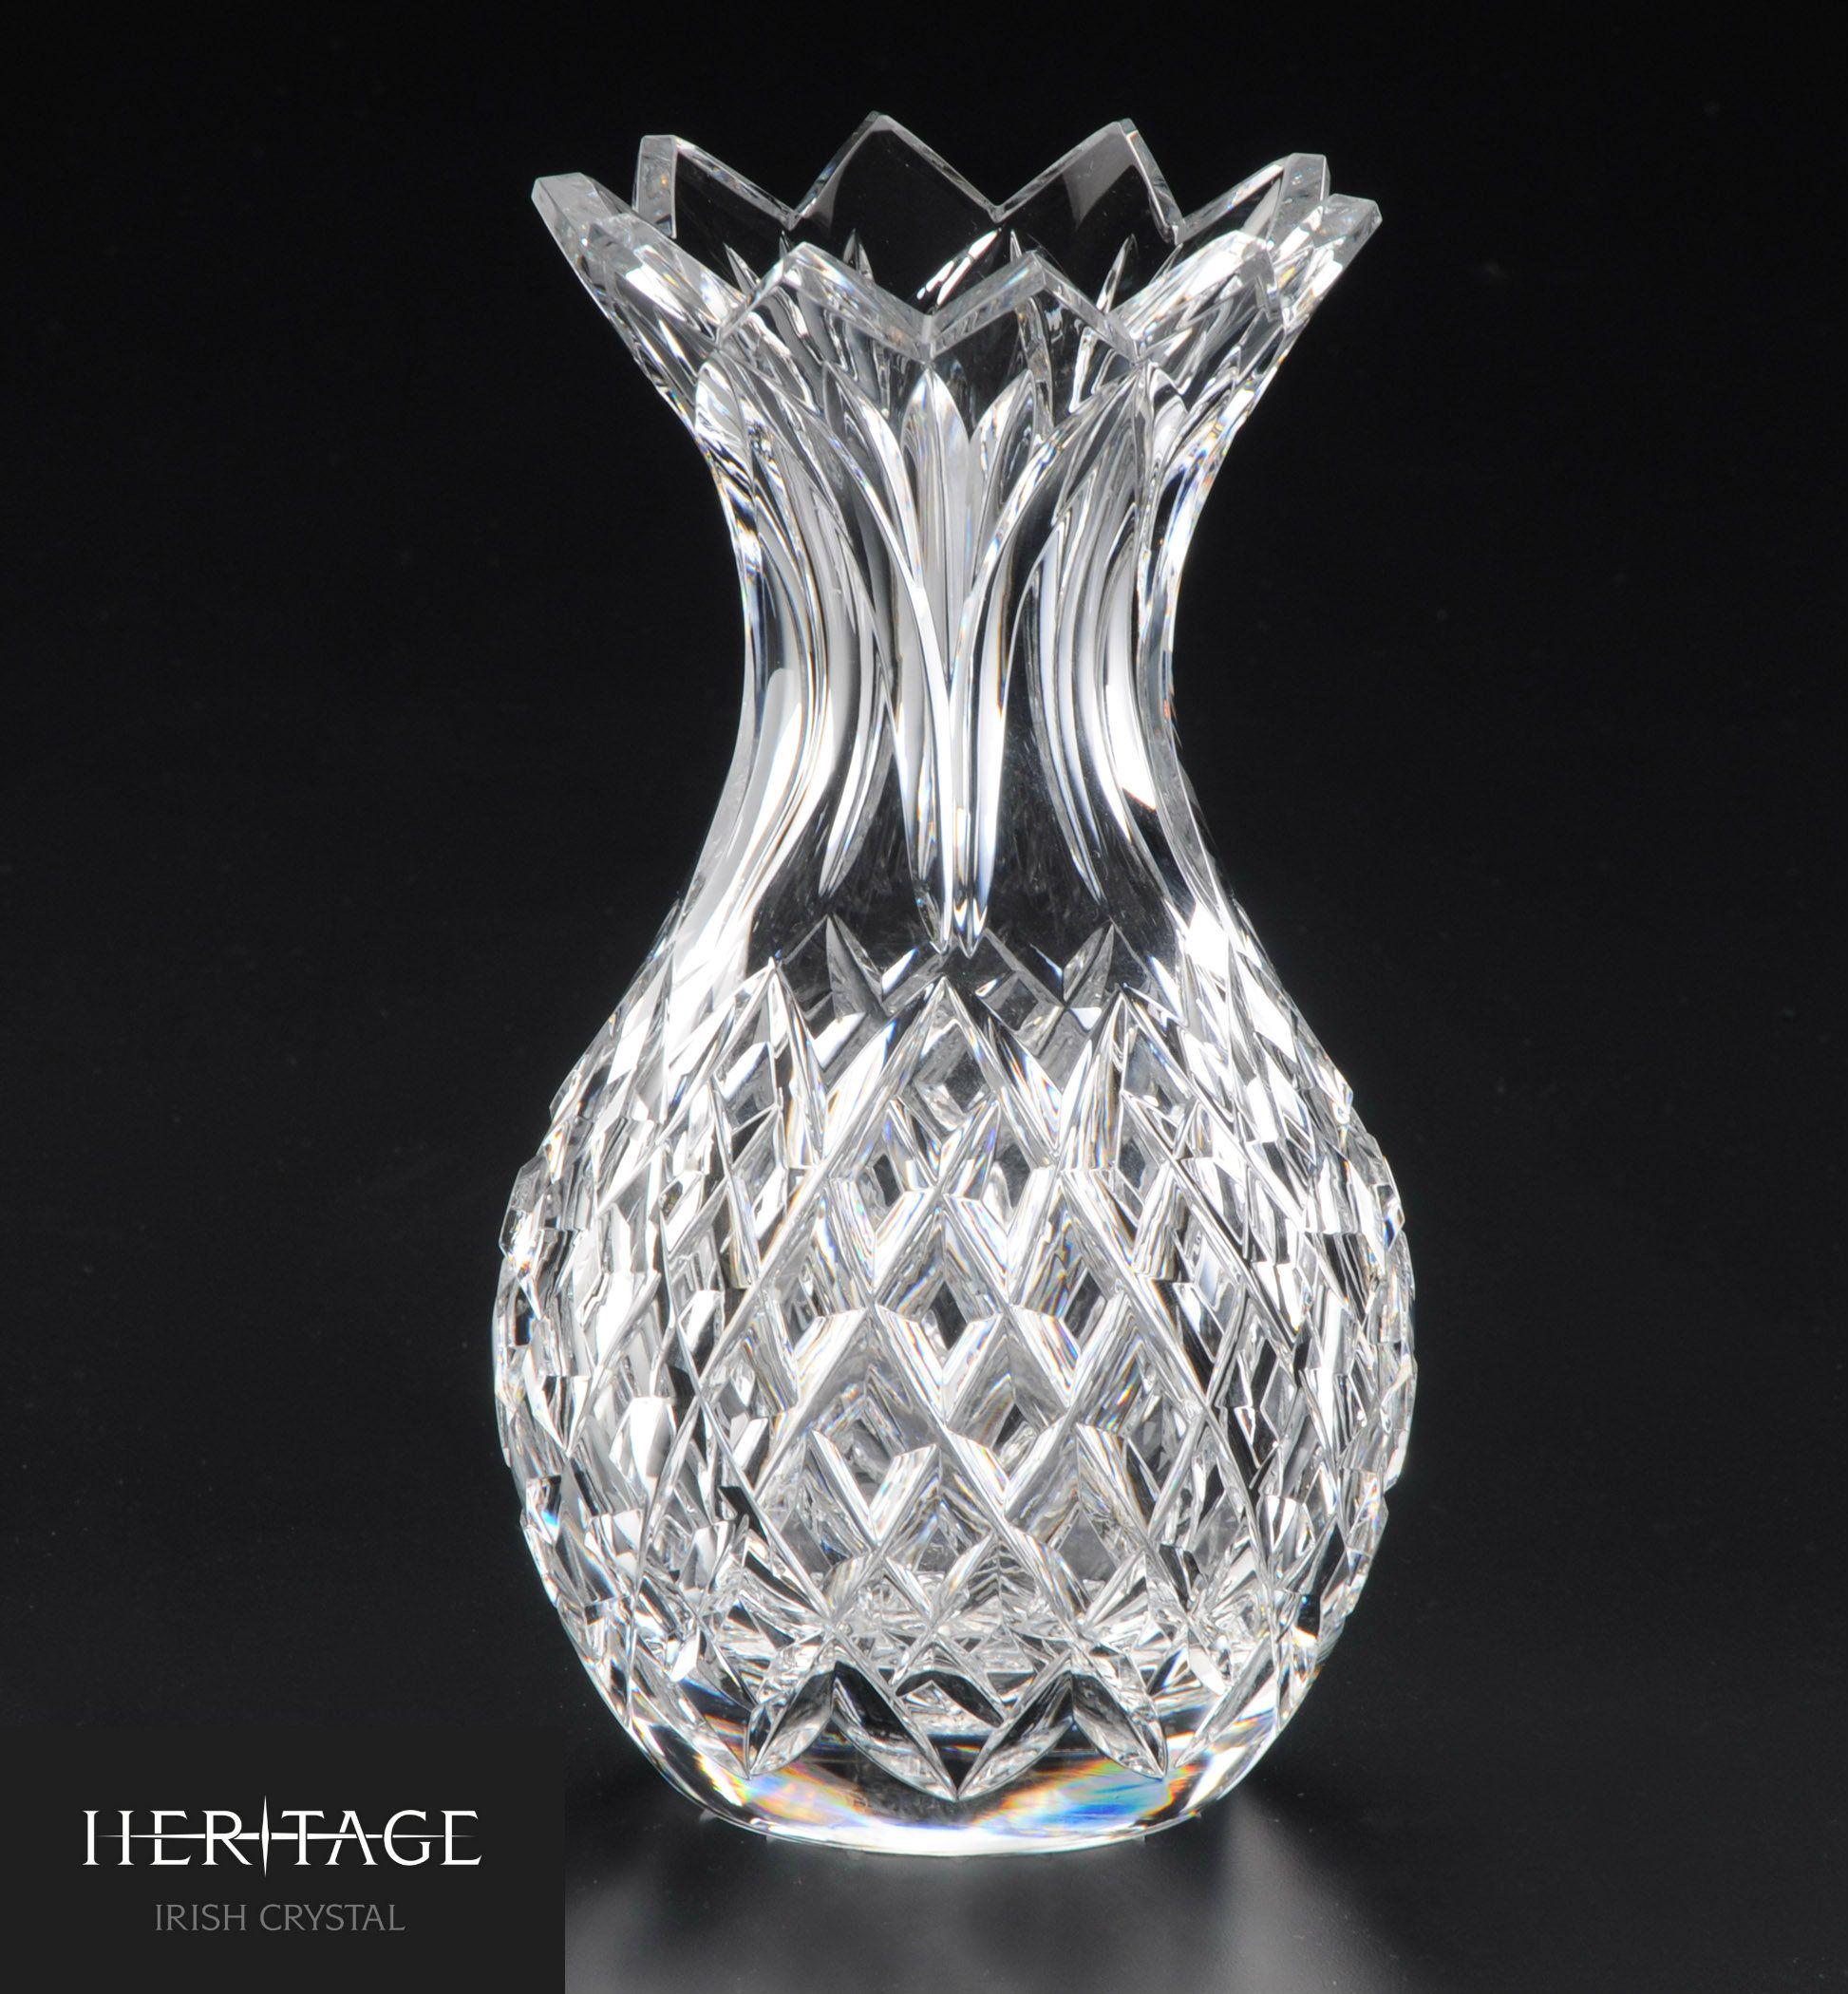 The heritage irish crystal pineapple vase is a pretty and fun the heritage irish crystal pineapple vase is a pretty and fun representation of this popular fruit reviewsmspy